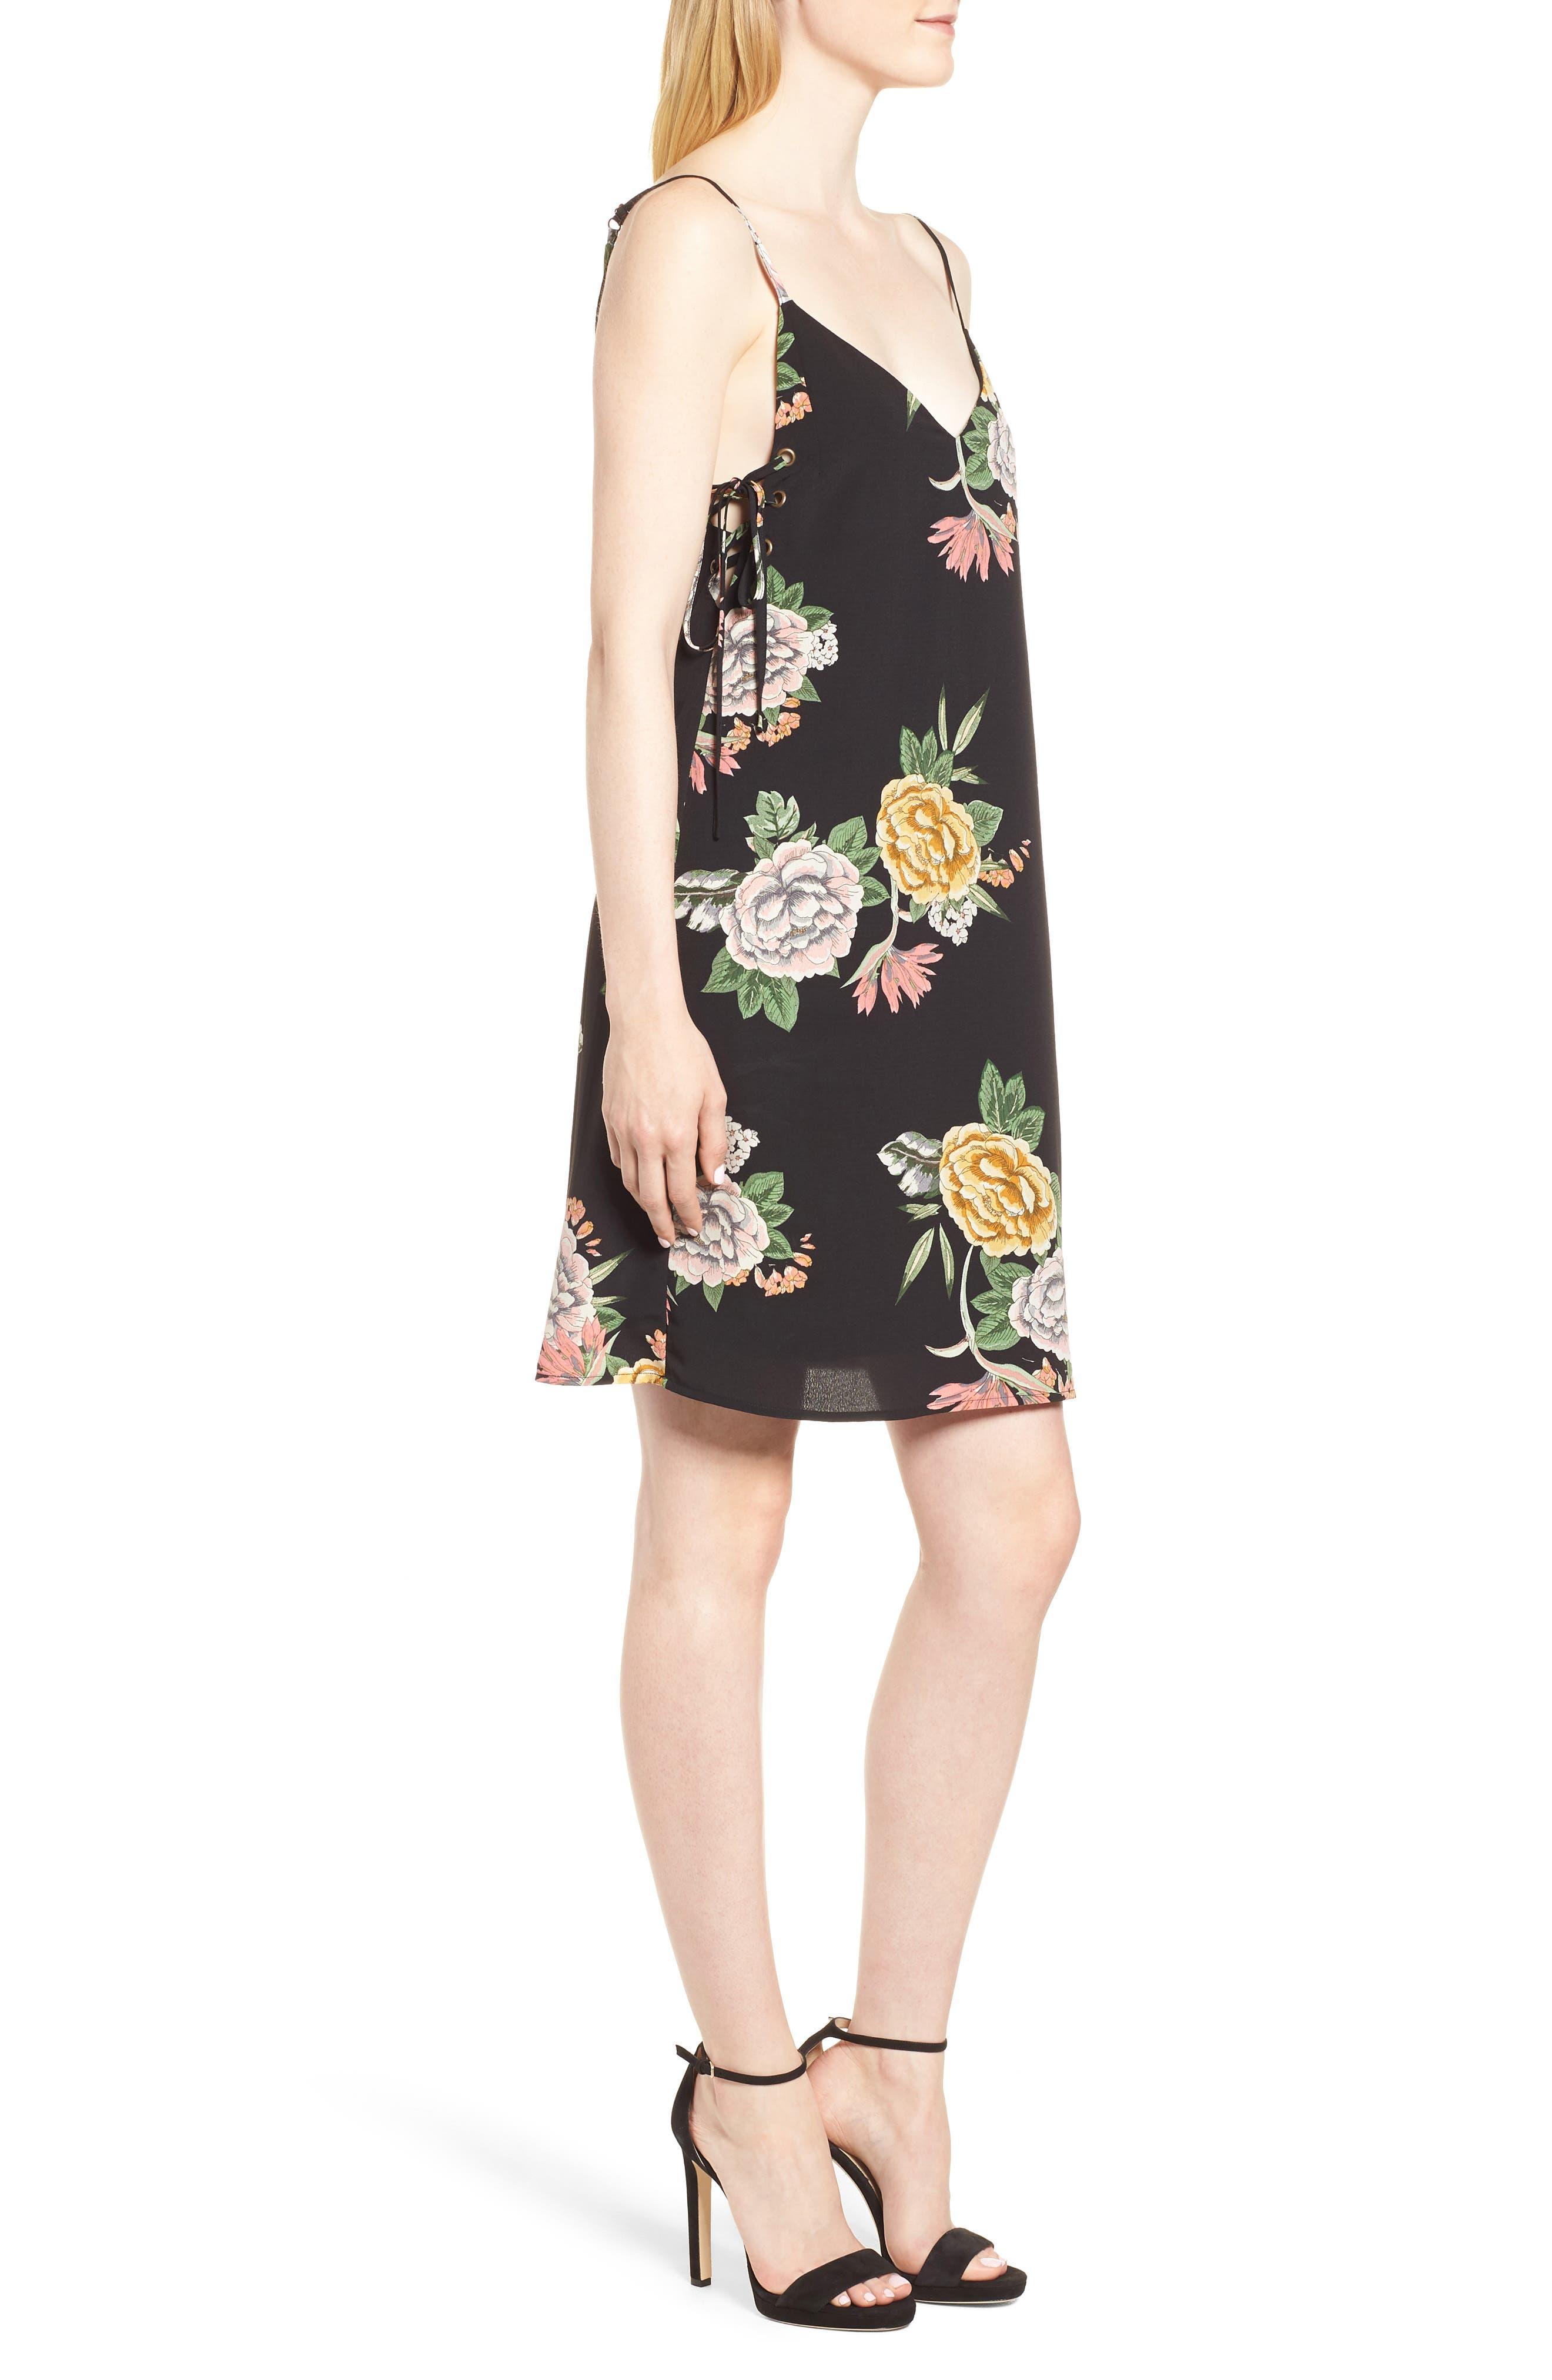 Enchanted Garden Lace-Up Dress,                             Alternate thumbnail 3, color,                             ENCHANTED GARDEN PRINT